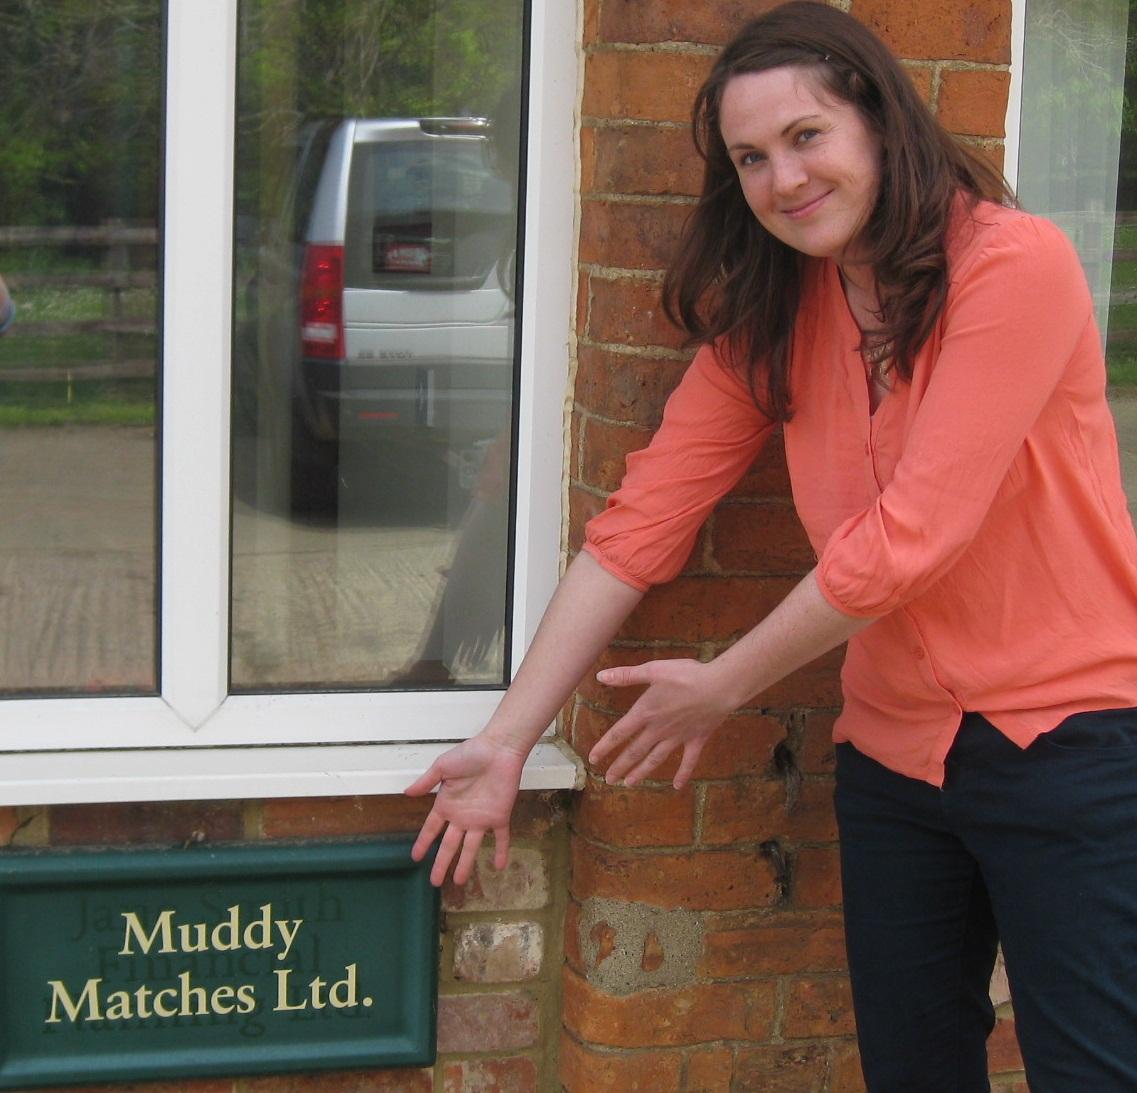 Muddy matches dating website